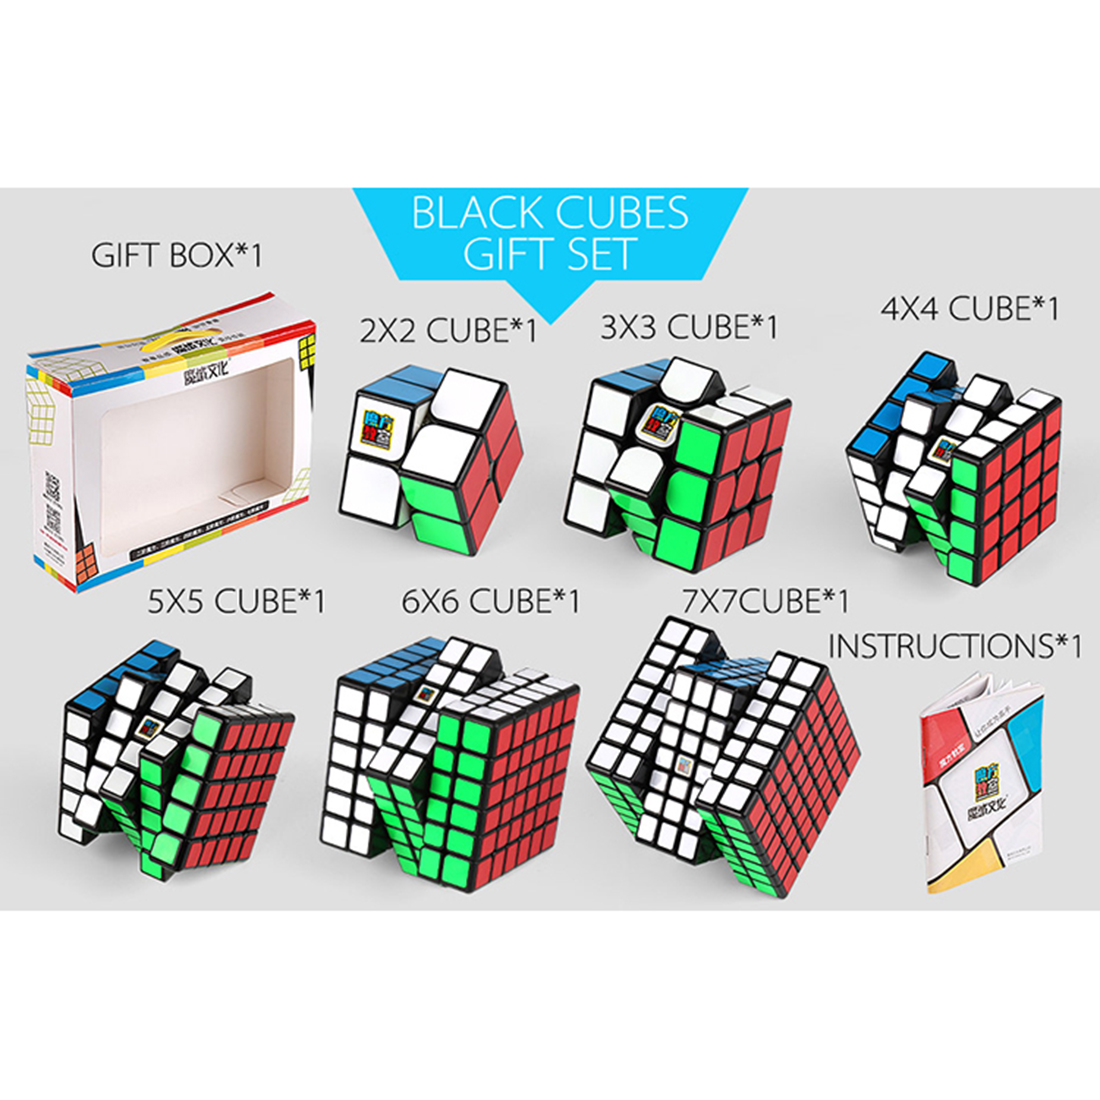 Mofangjiaoshi MFJS Package Set Gift Cube Cubing Classroom 2 7 Steps Magic Cube Set with Gift